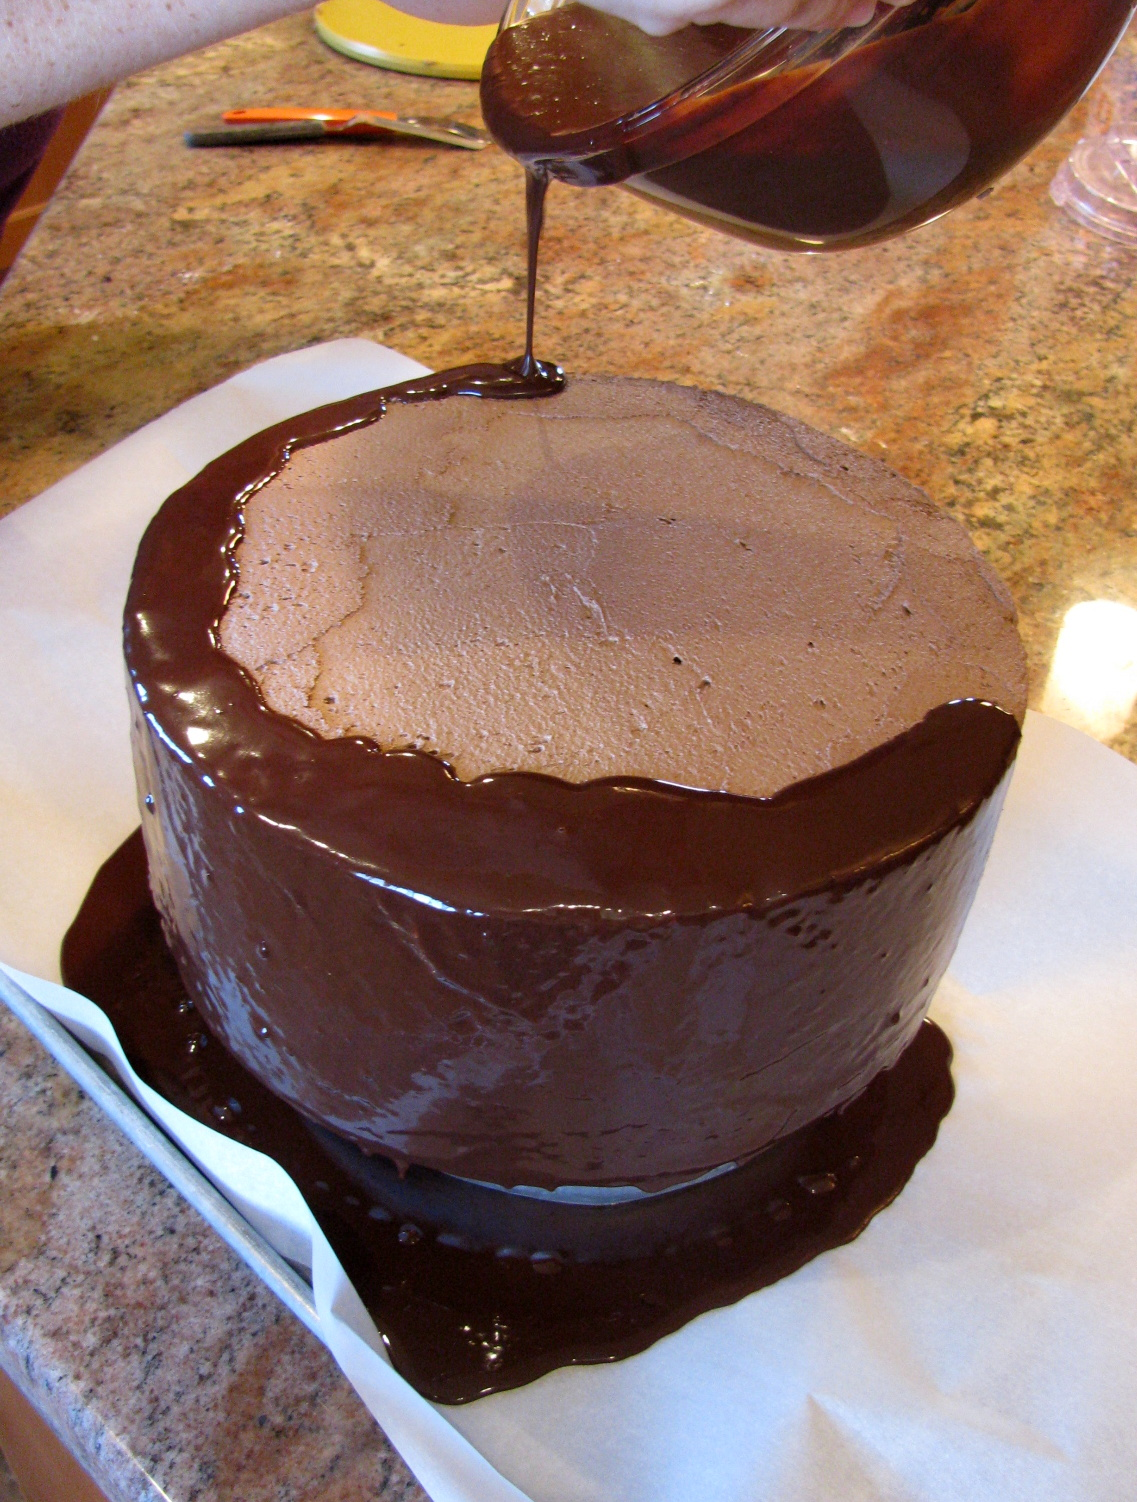 Decorator's Chocolate Buttercream Frosting